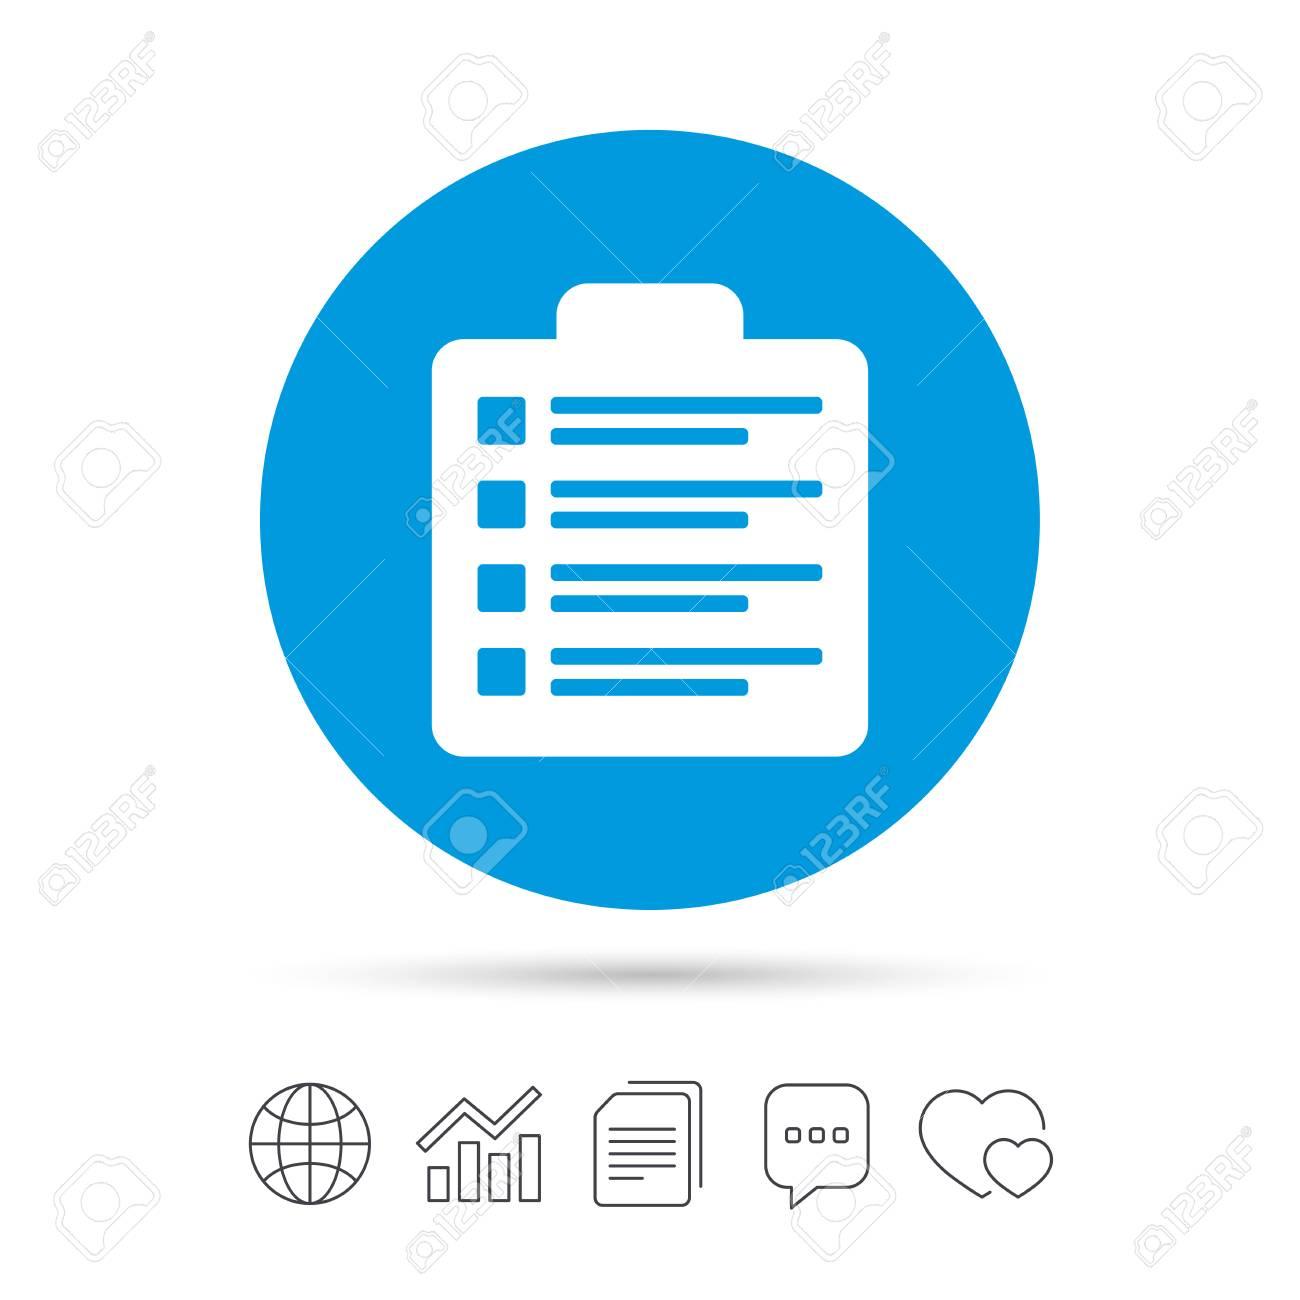 checklist sign icon control list symbol survey poll or questionnaire